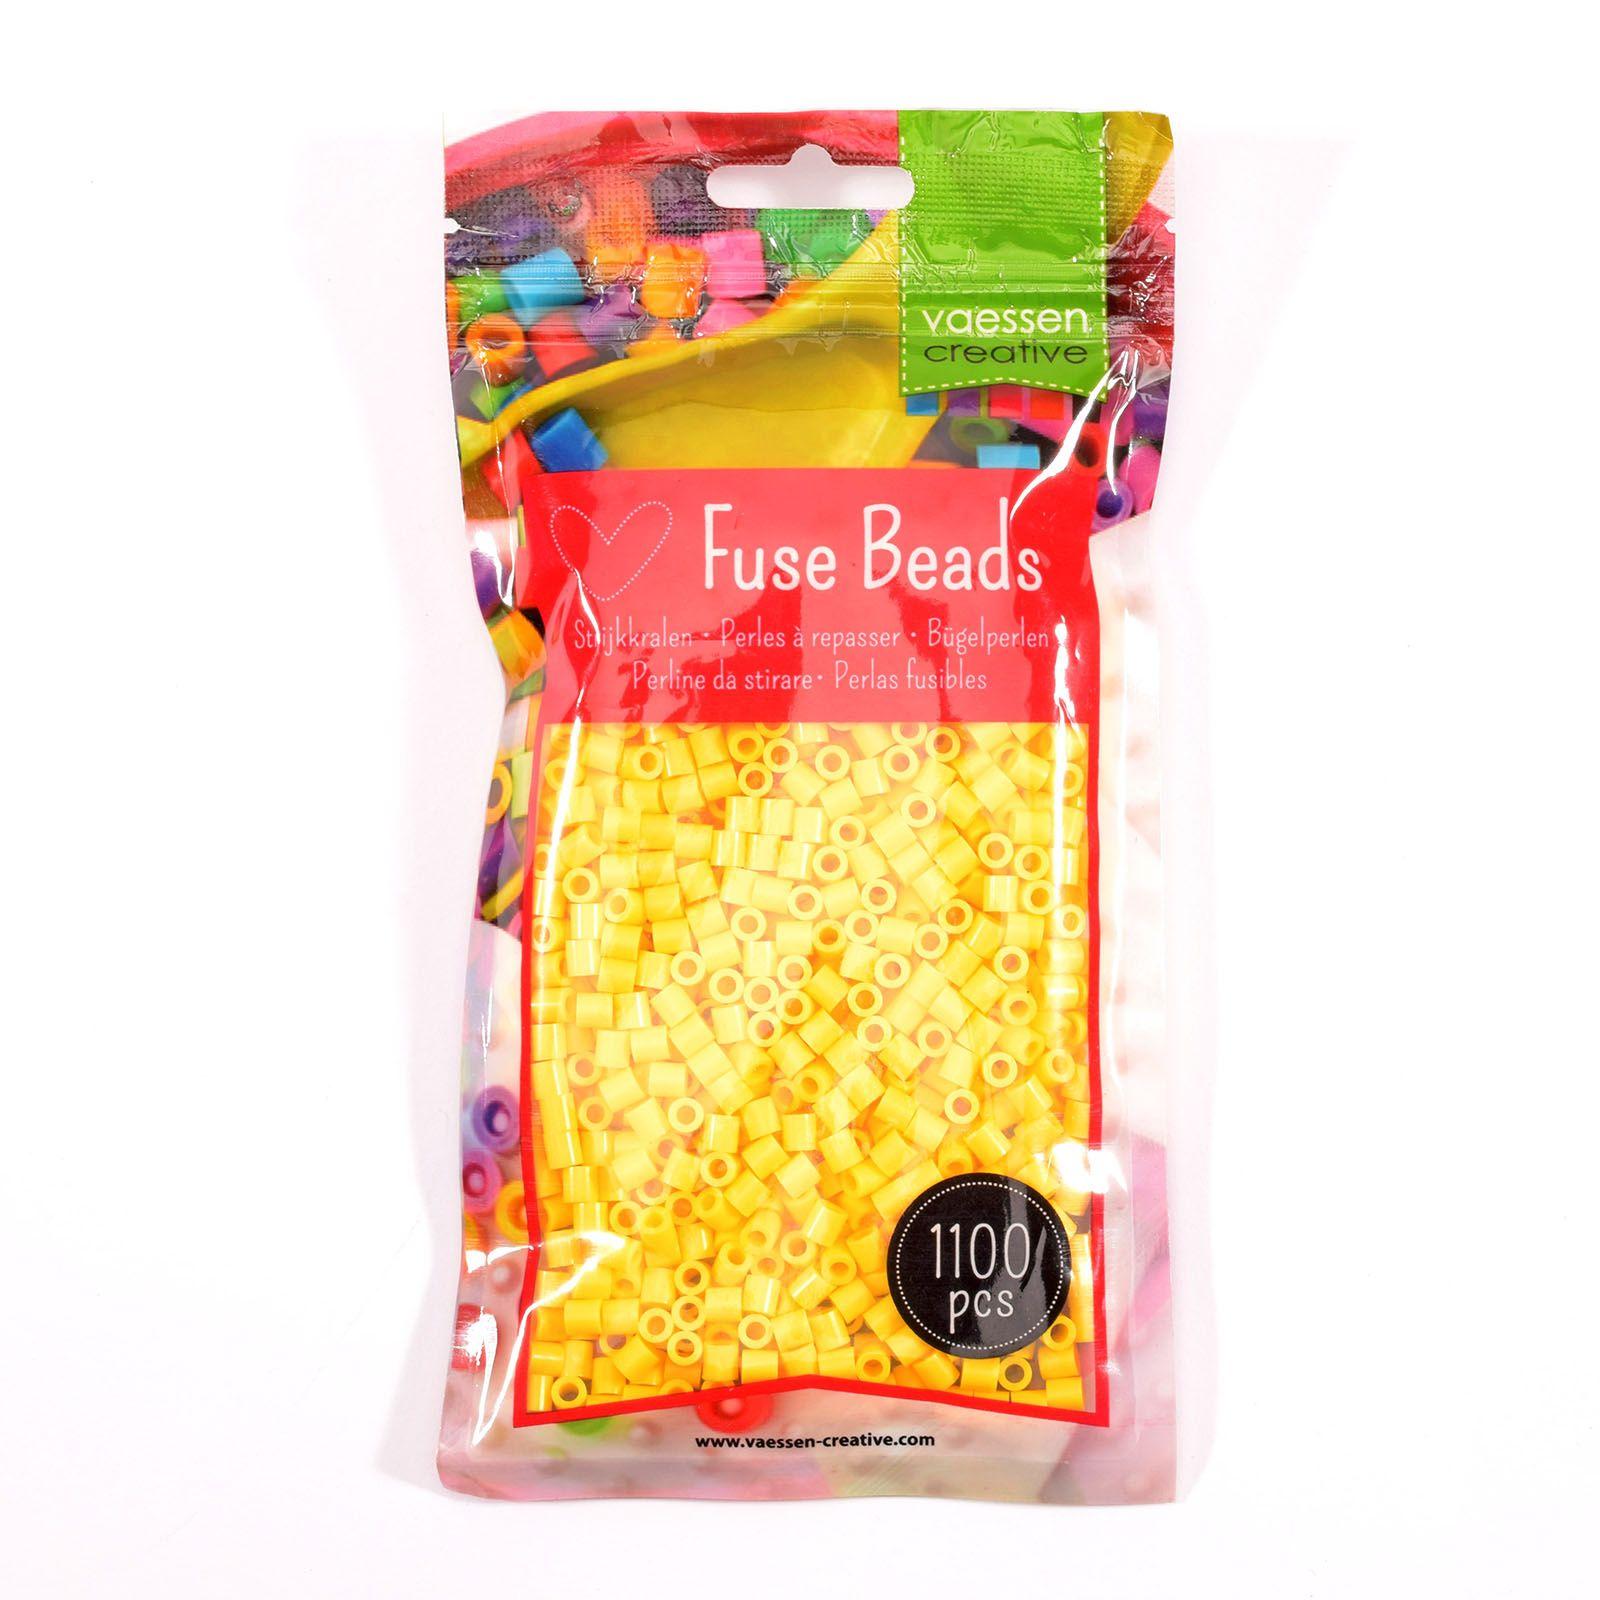 Sachet de 1100 perles à repasser - Ø5 mm Coloris jaune